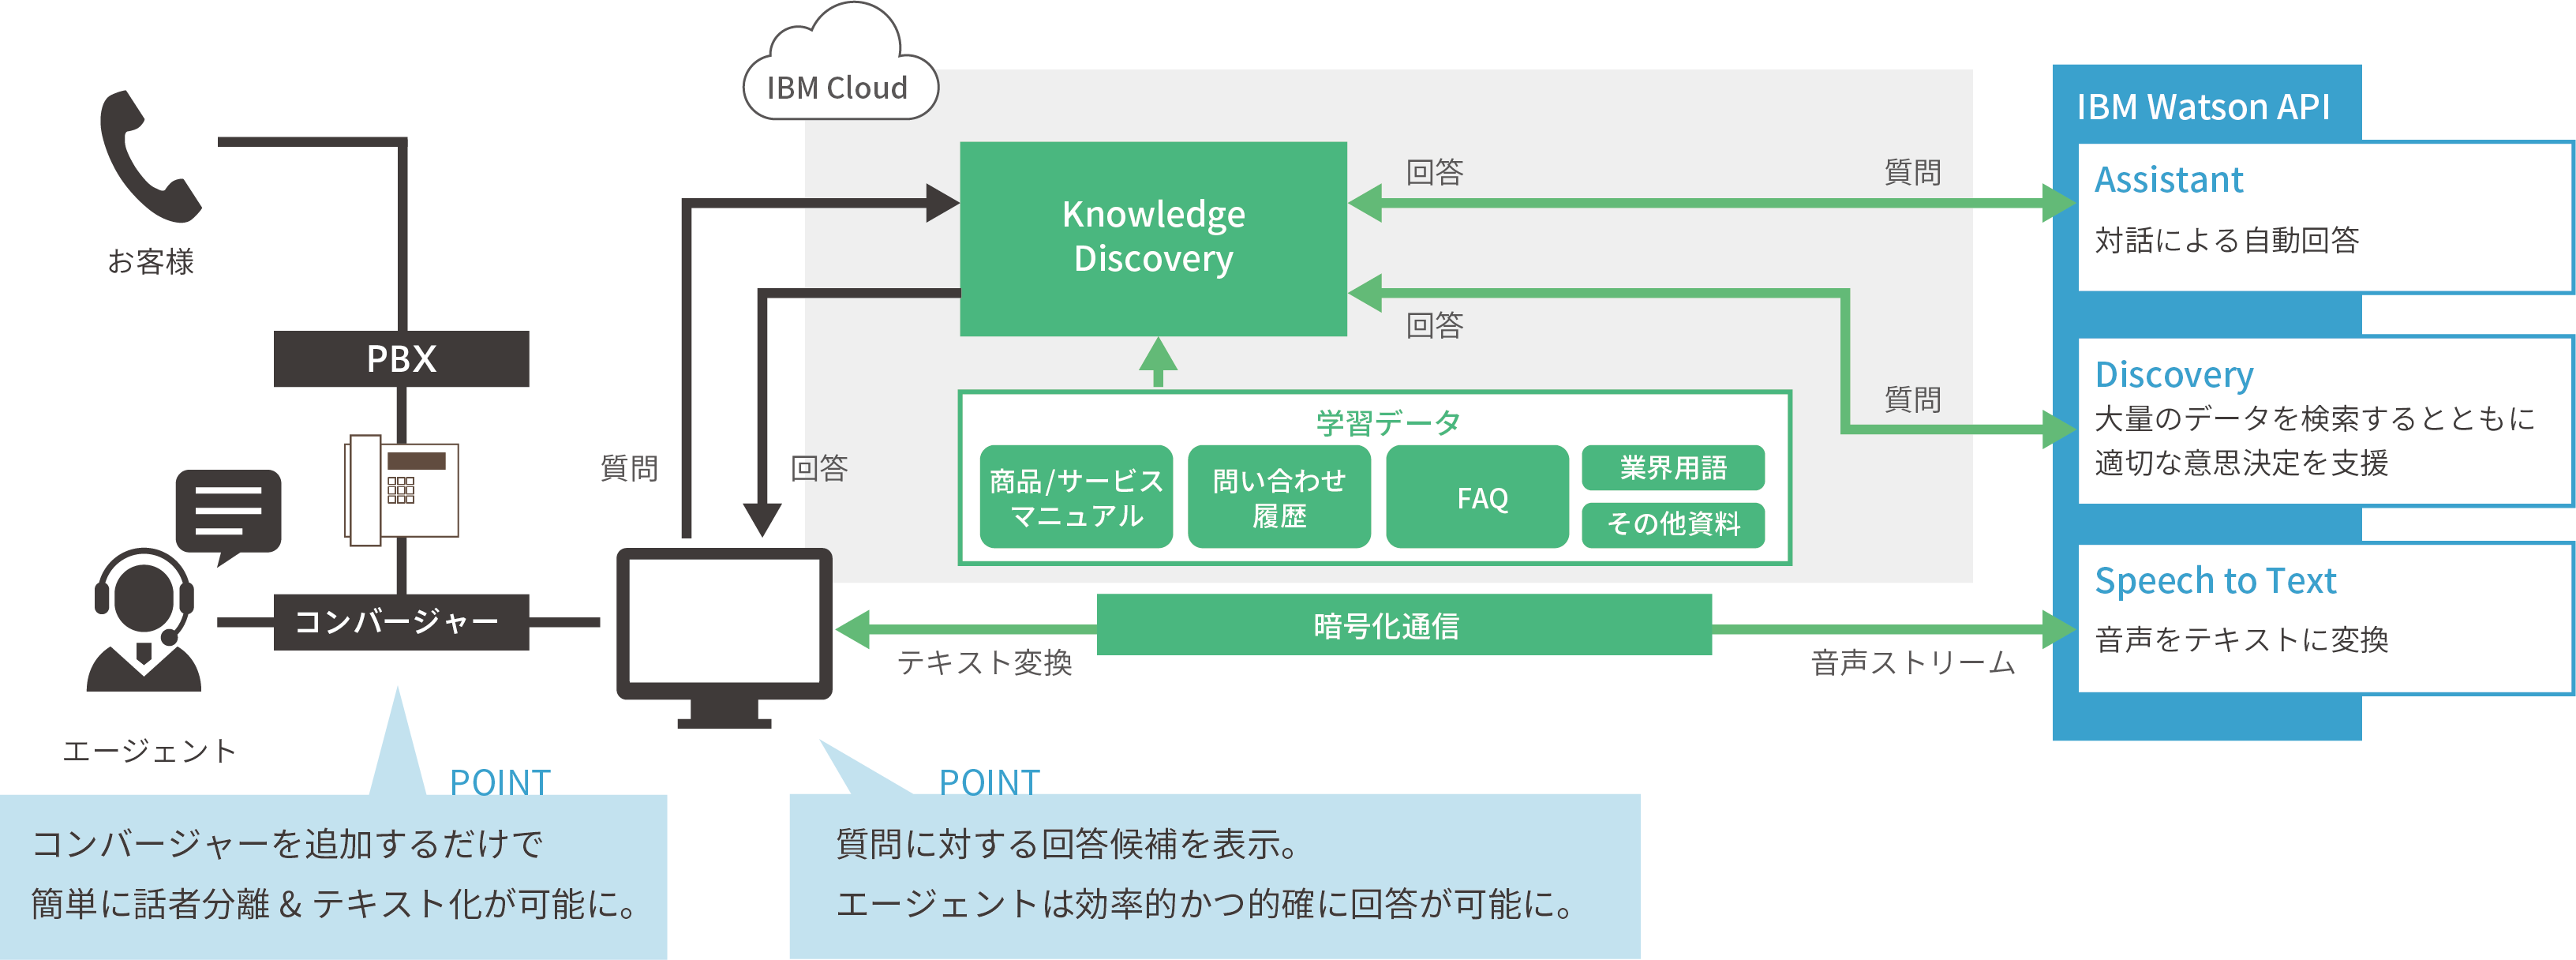 Knowledge Discovery システム構成図